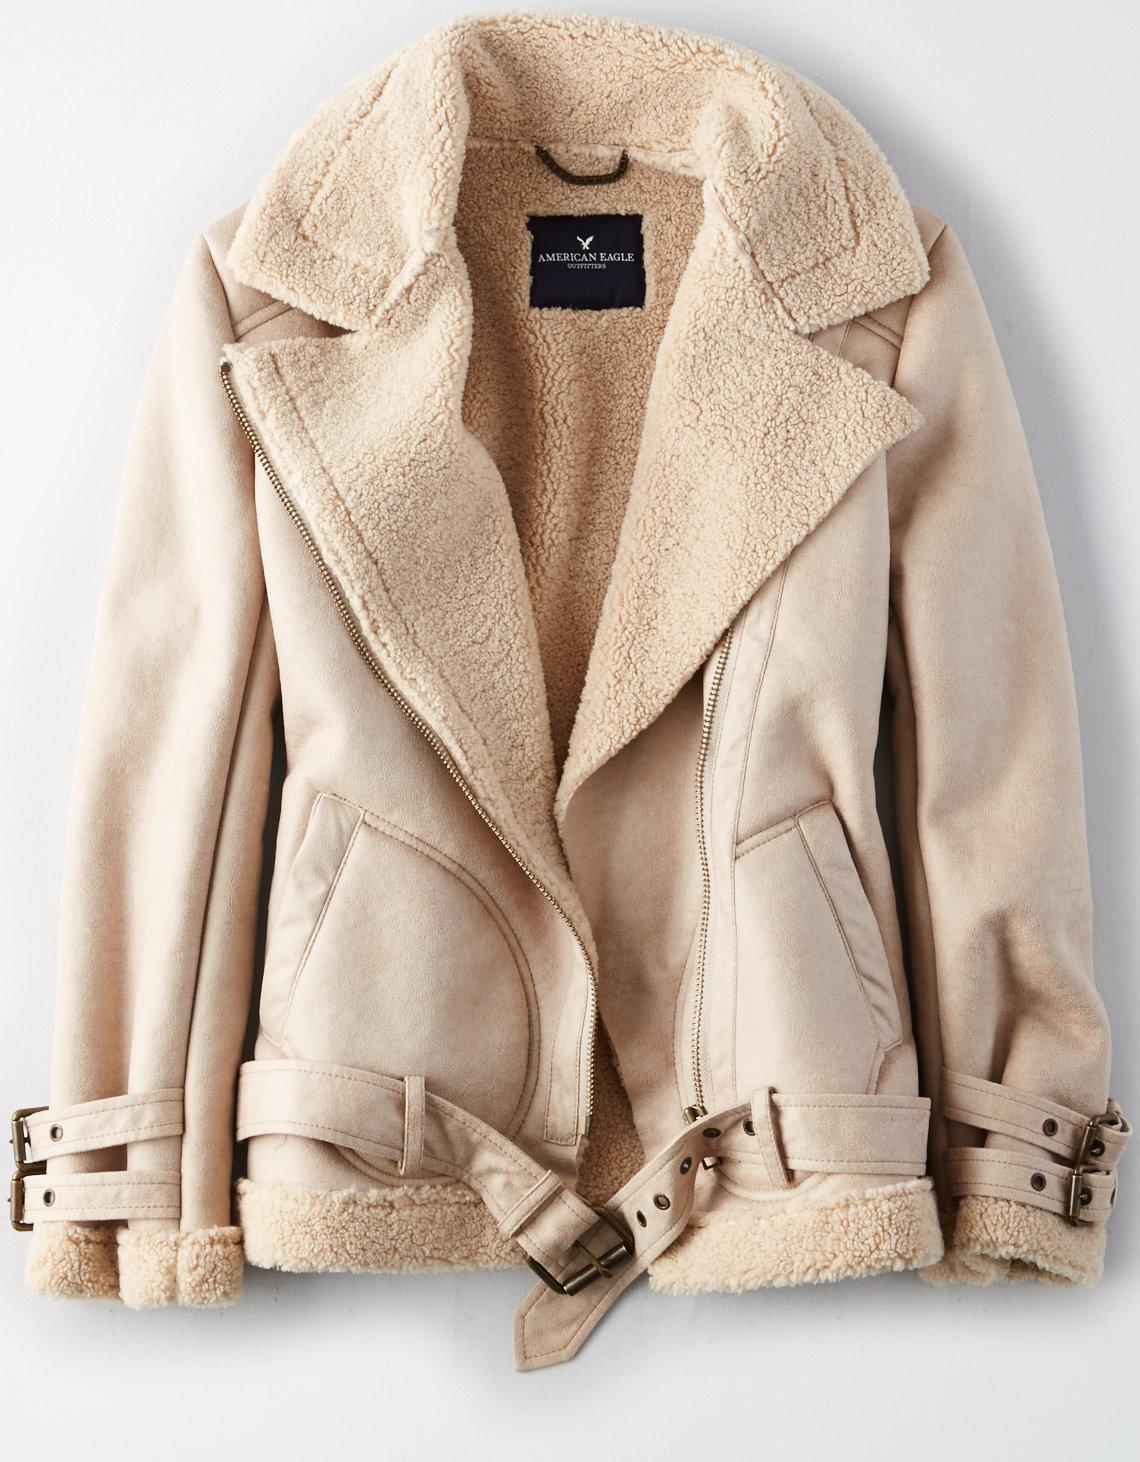 tanger outlets american eagle beige shearling jacket